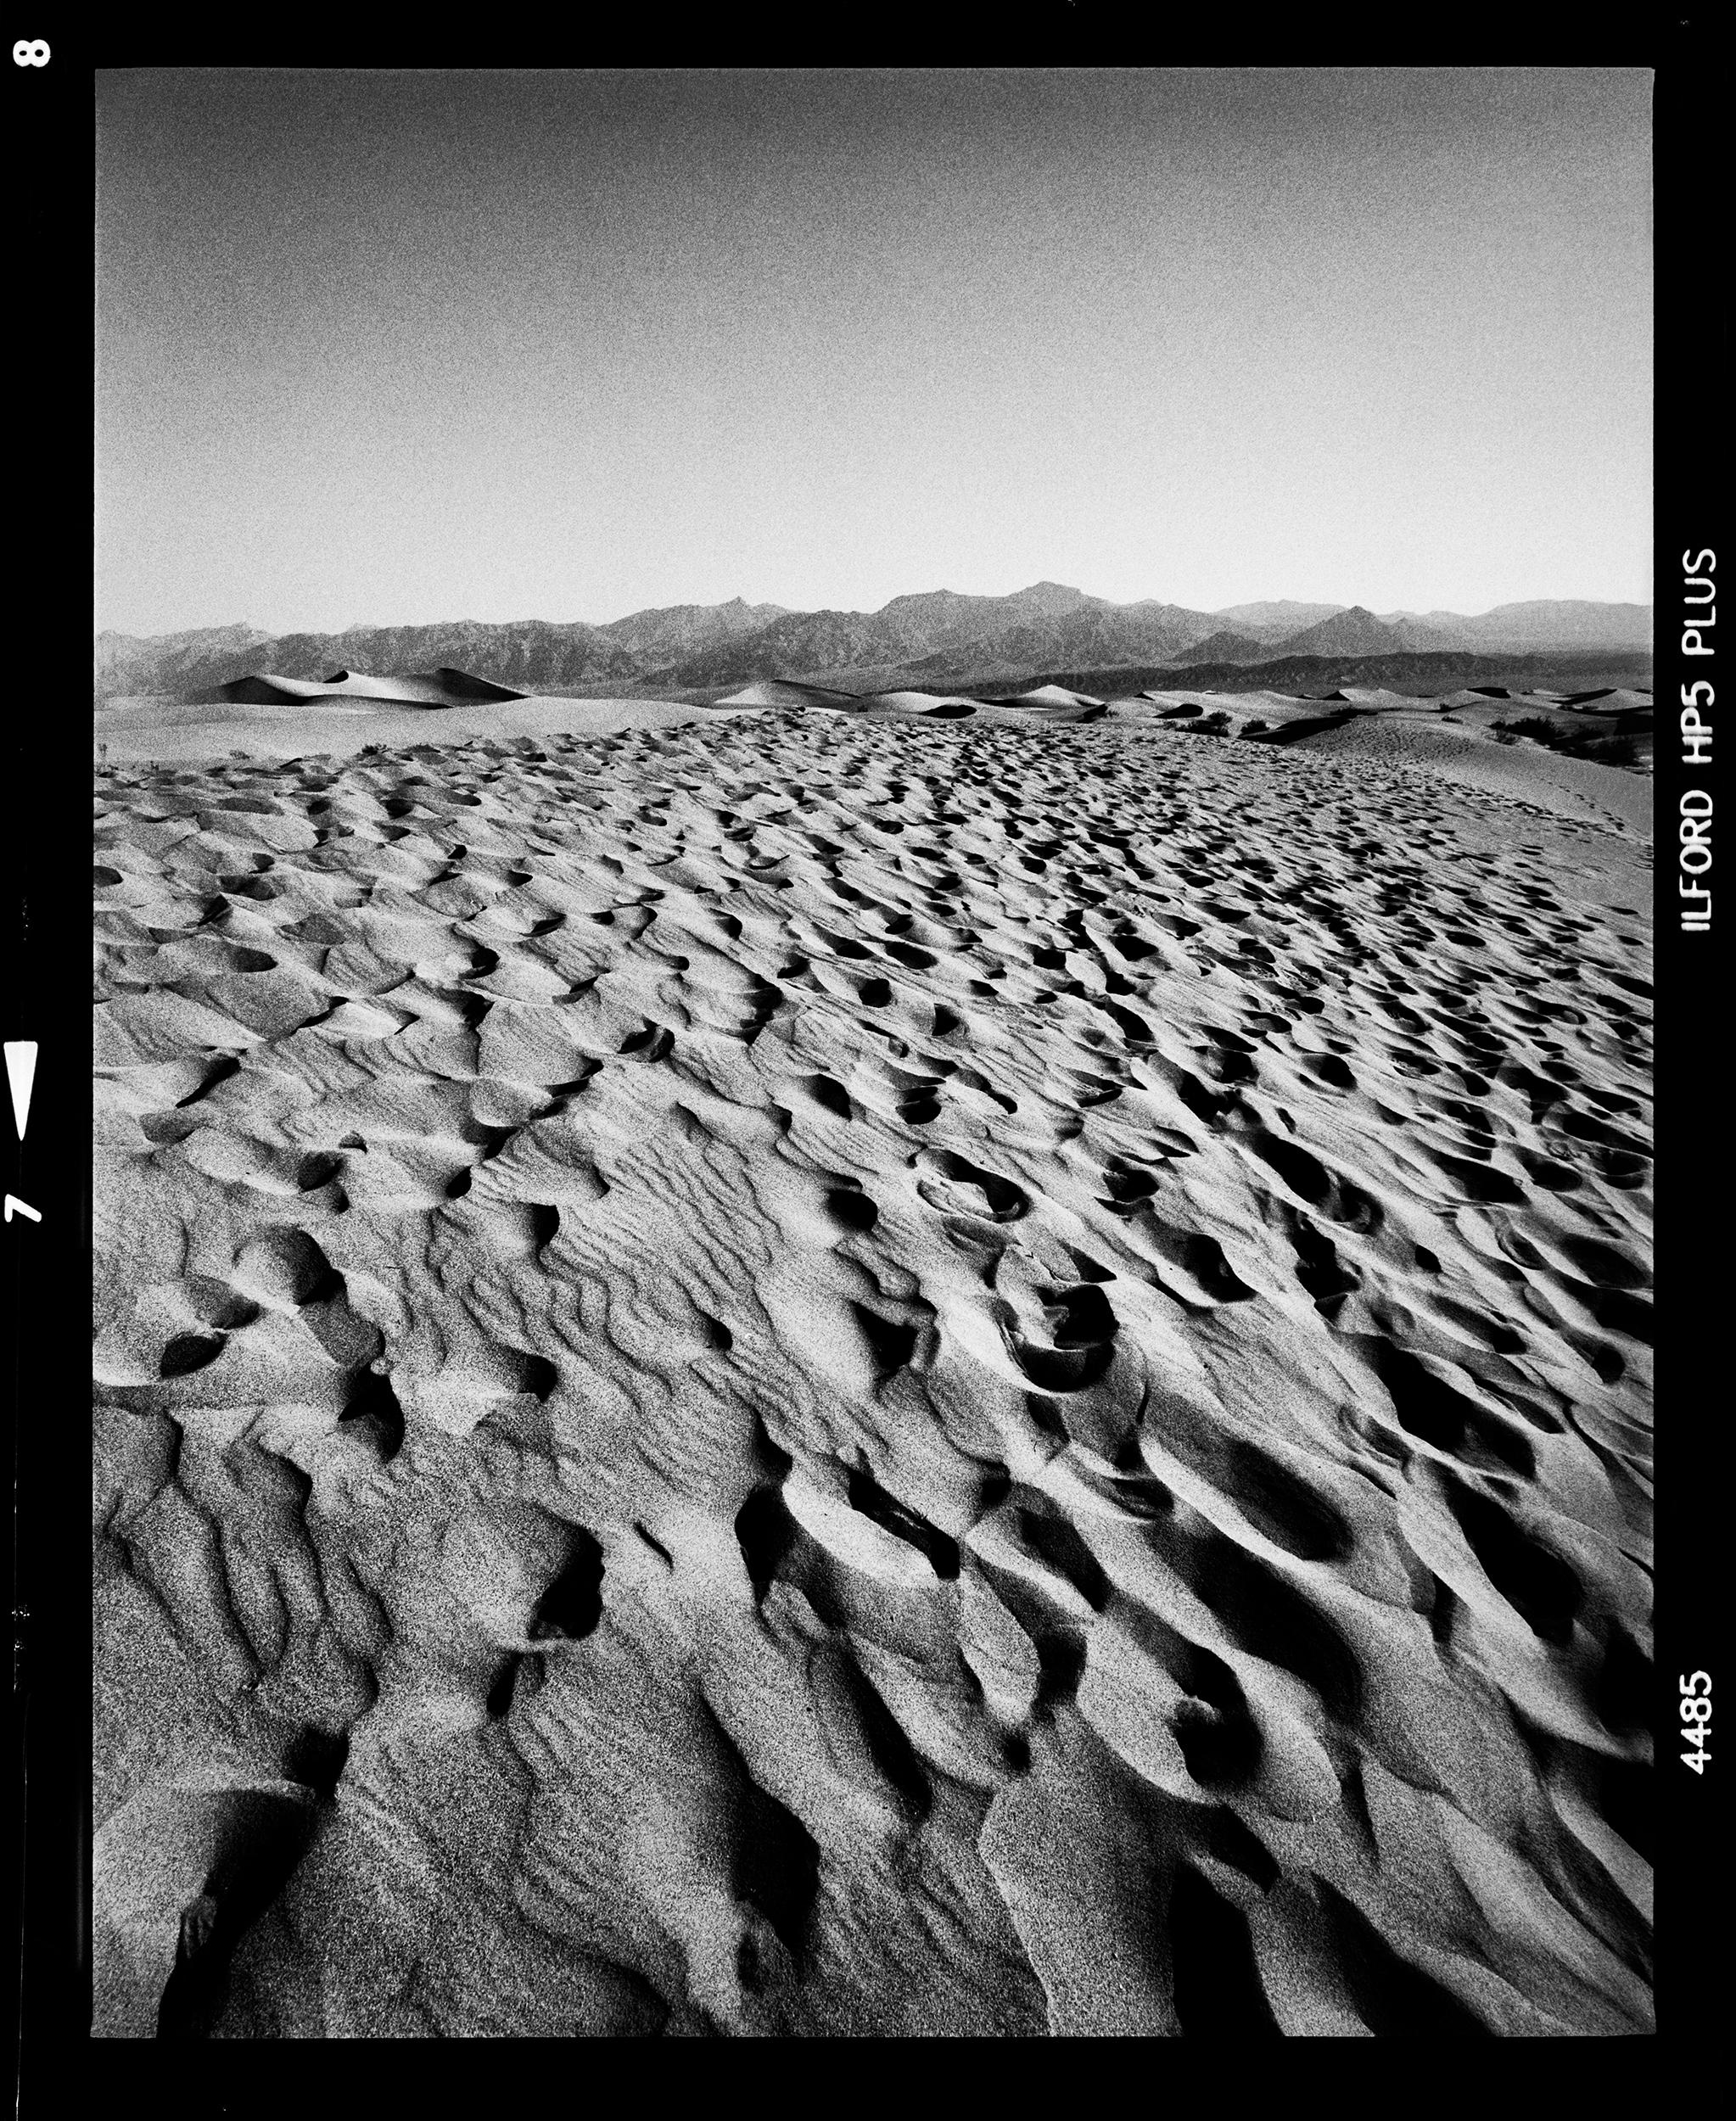 DeathValley_Desert_Fine_Art_Landscape_Photographer_Julien_Balmer.jpg